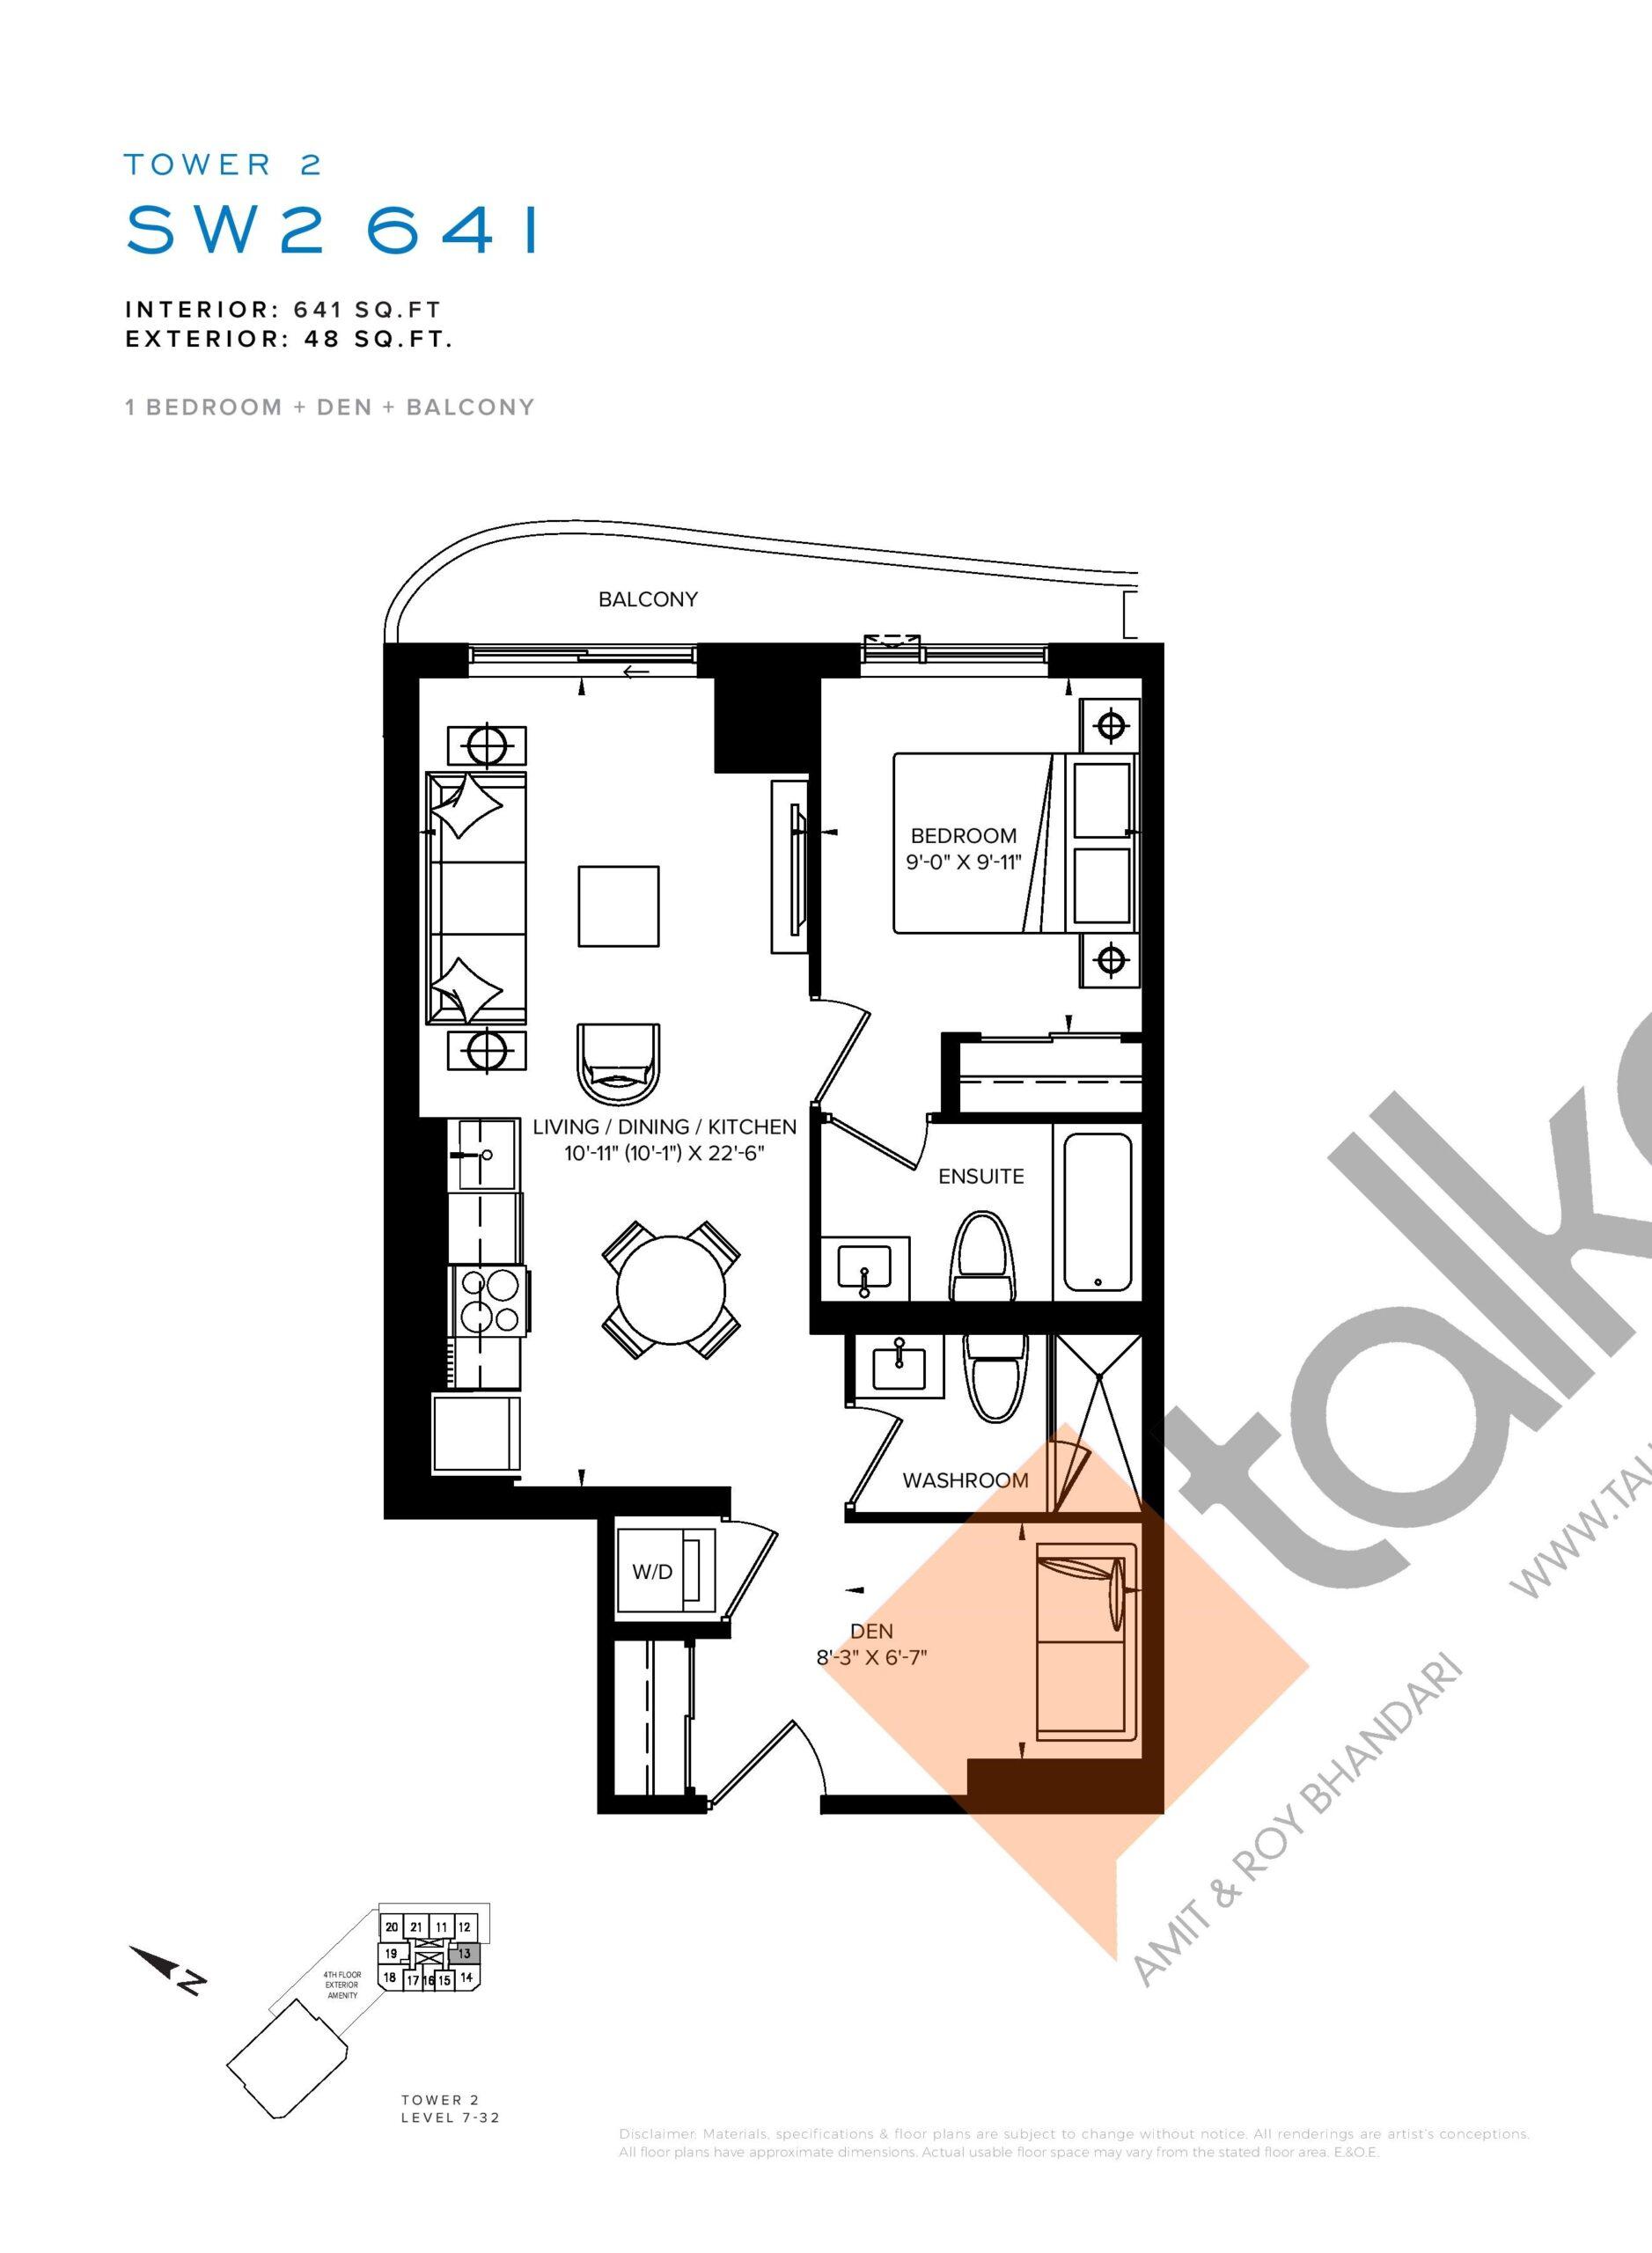 SW2 641 Floor Plan at SXSW Tower 2 Condos (SXSW2) - 641 sq.ft